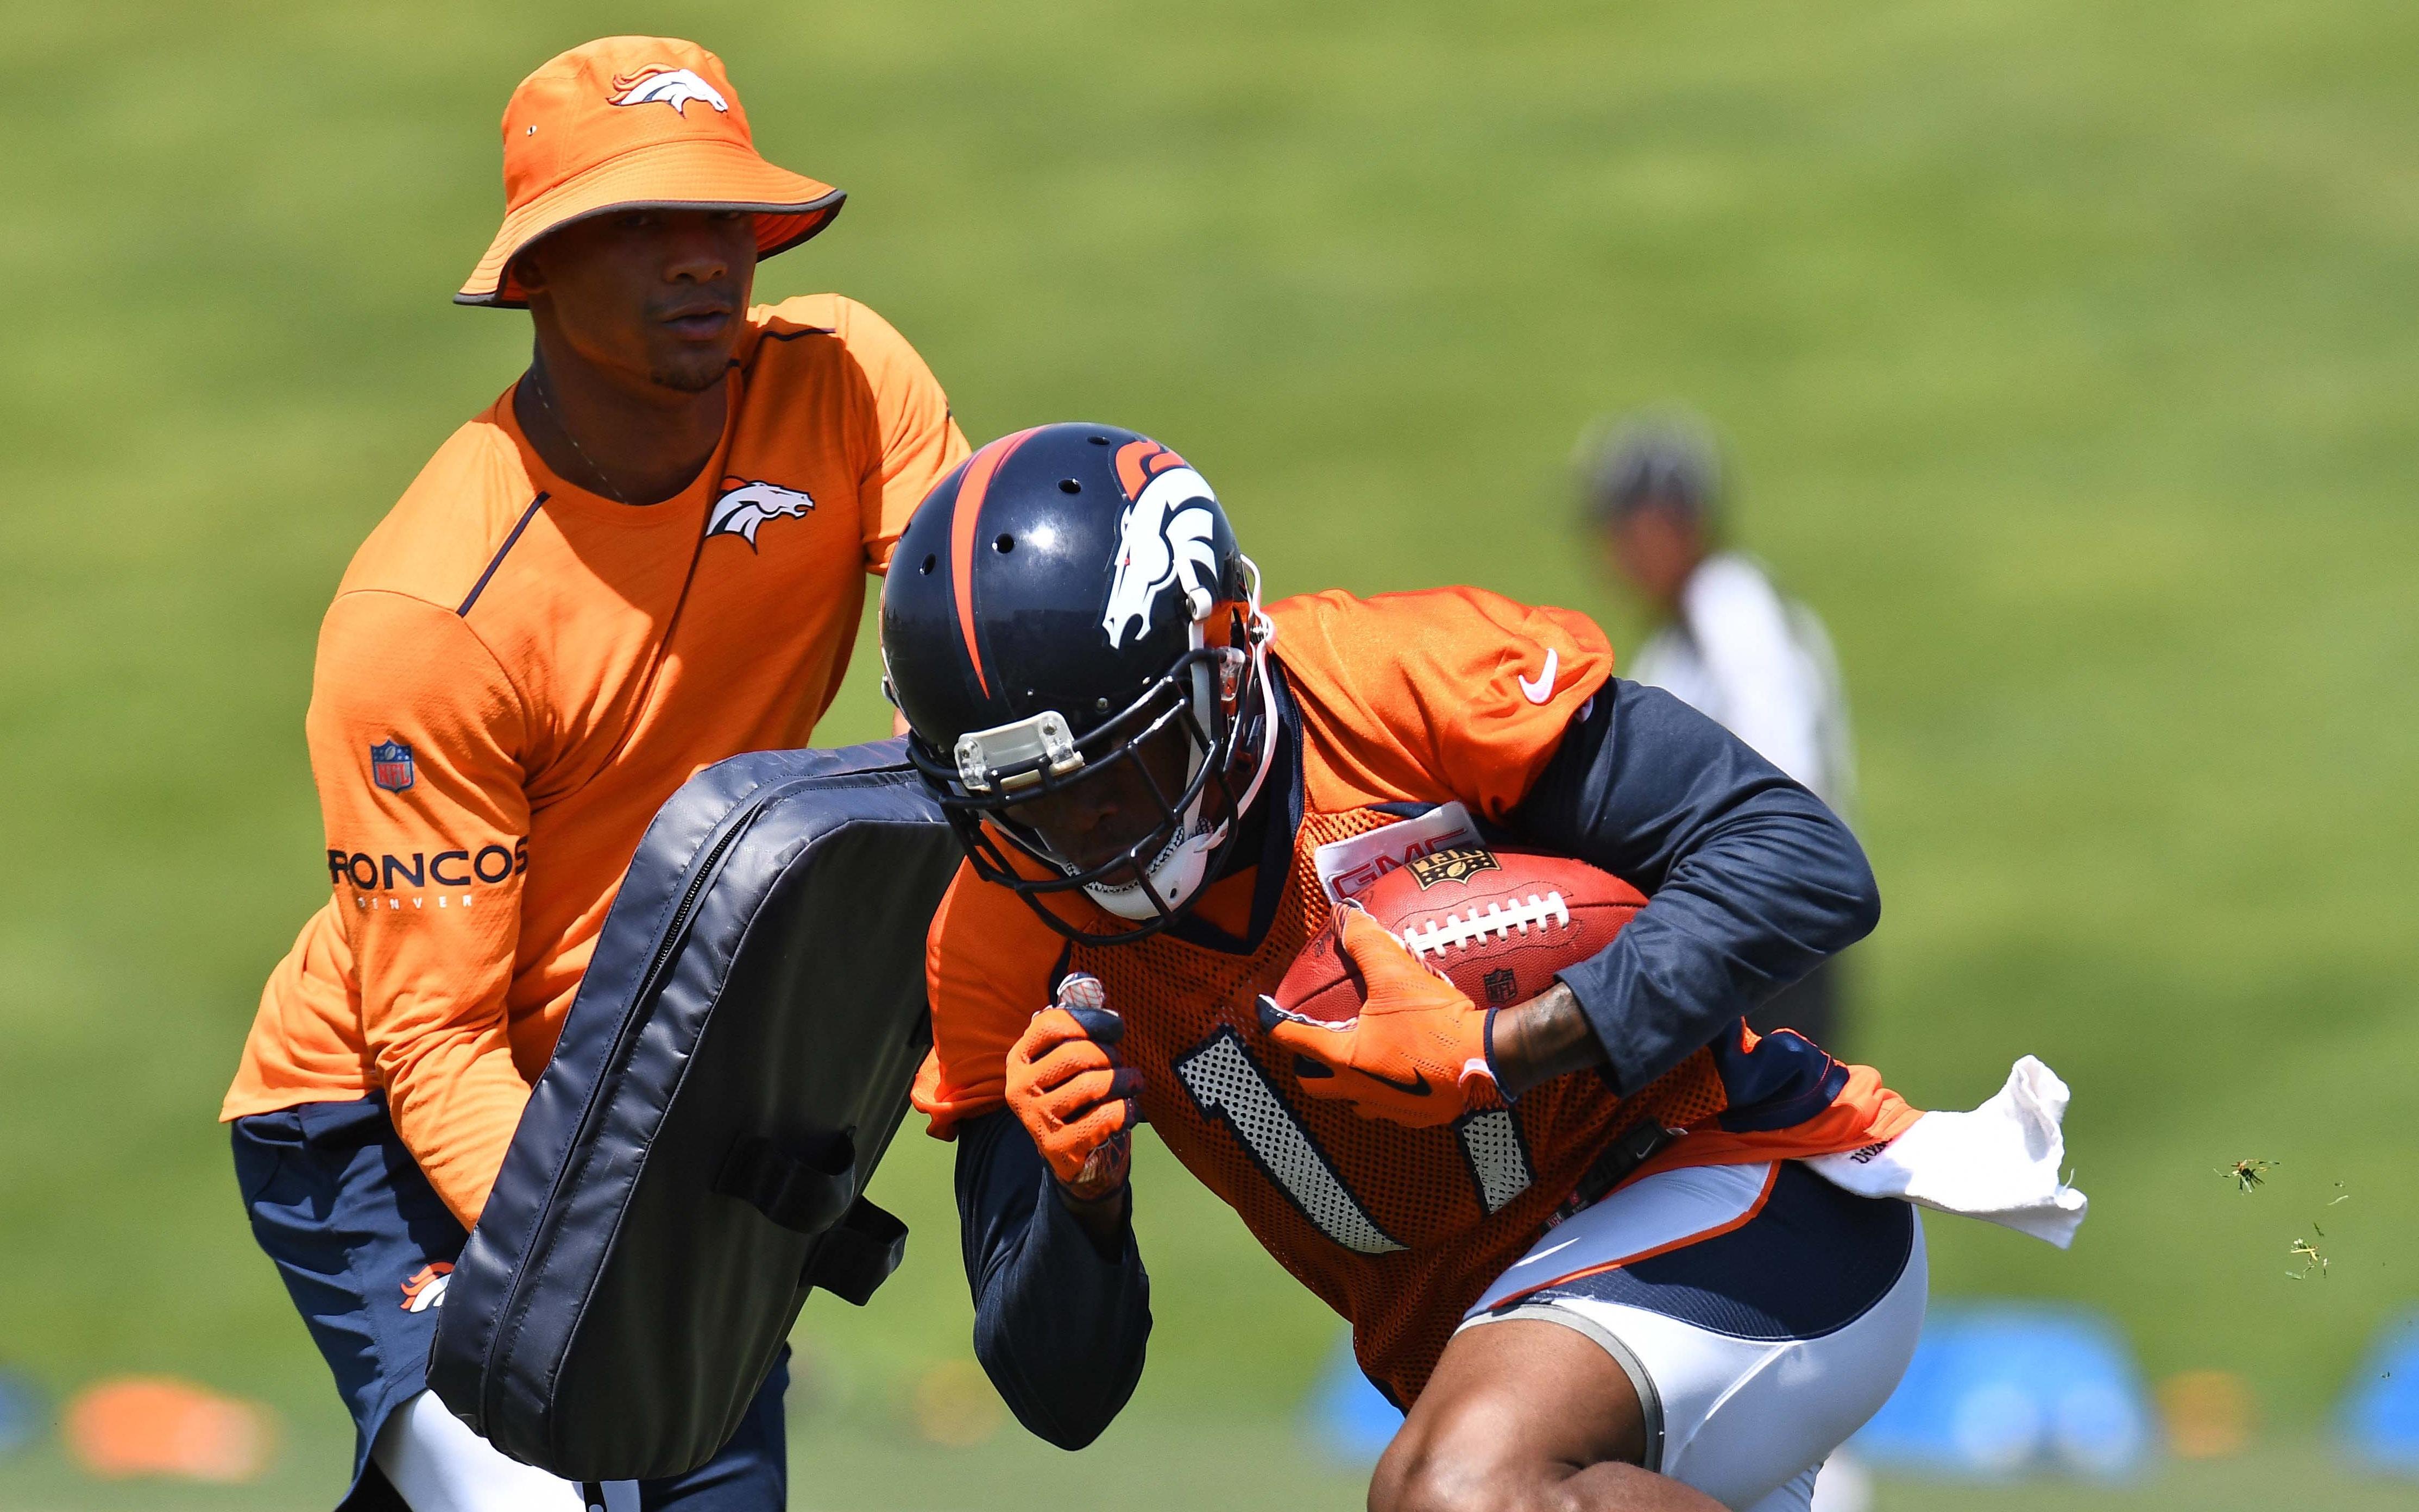 DaeSean Hamilton in Broncos mini-camp. Credit: Ron Chenoy, USA TODAY Sports.